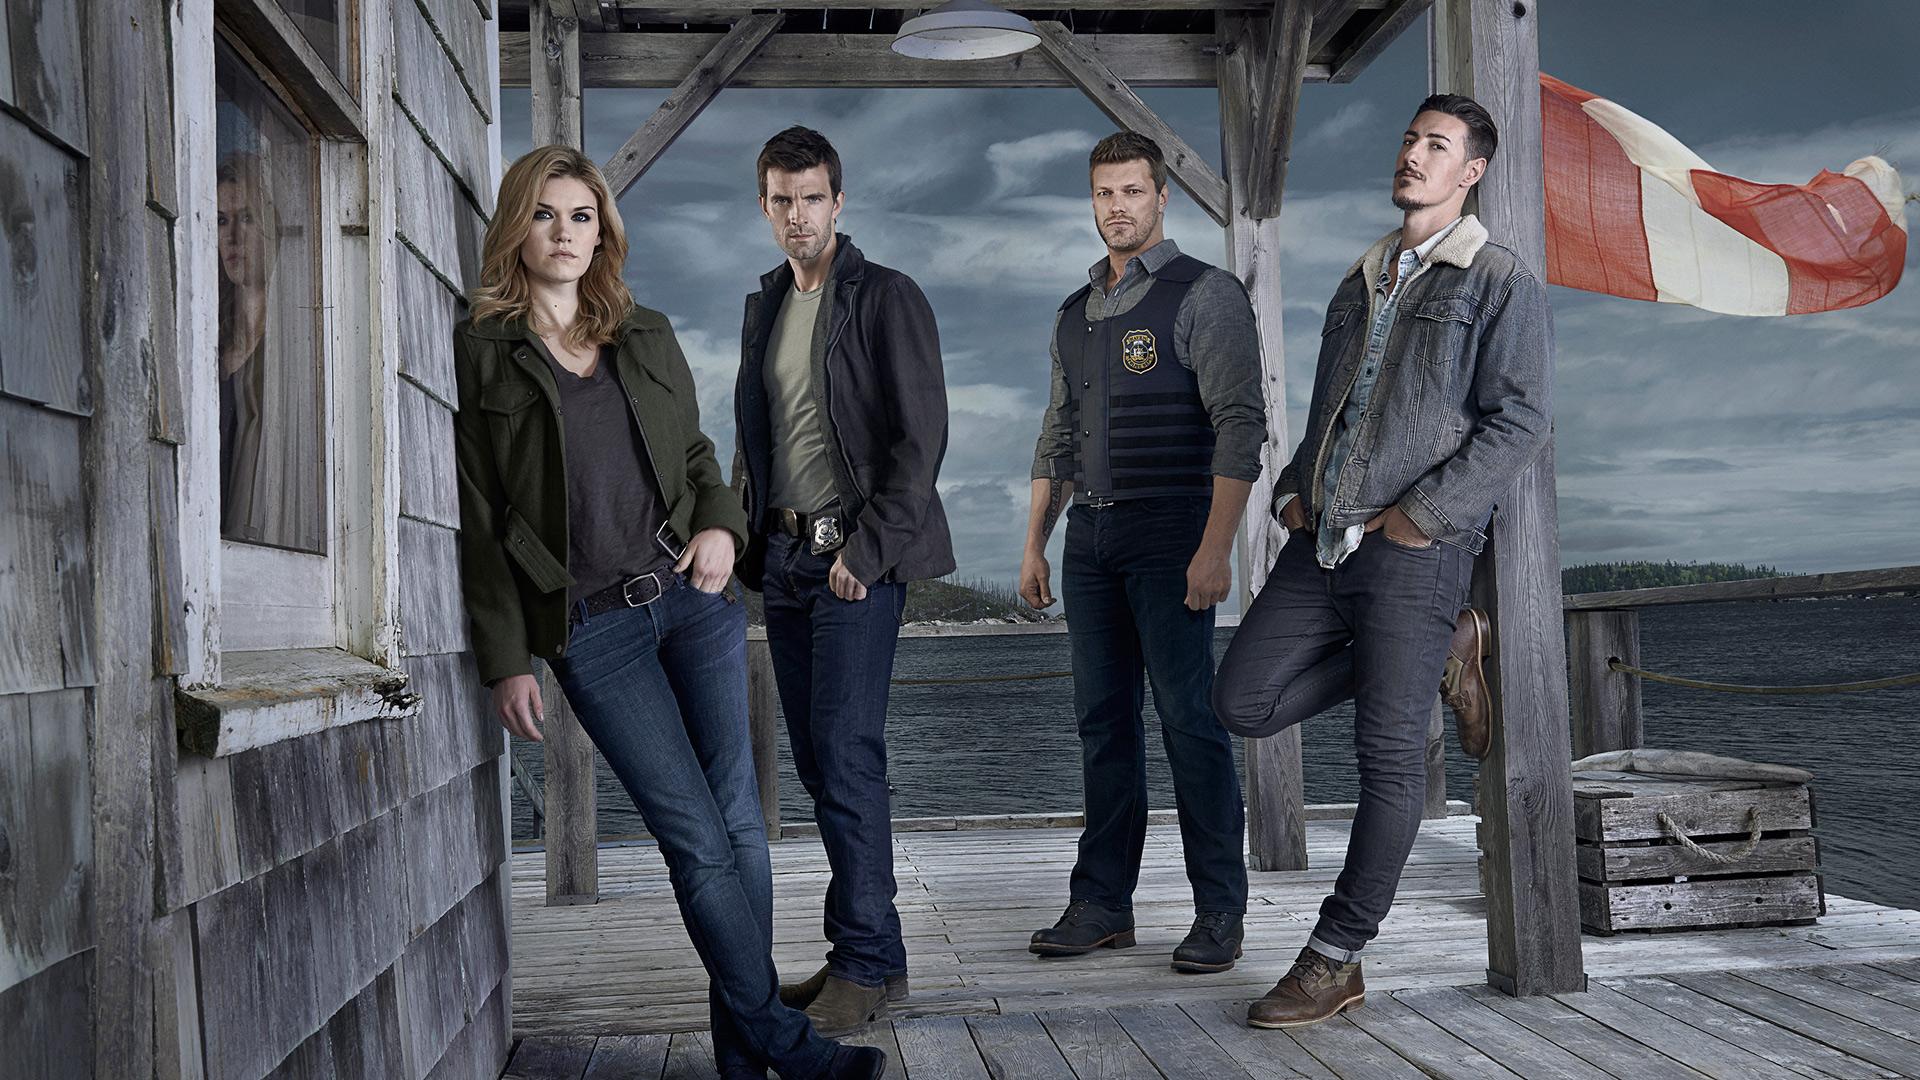 haven-tv-series-cast-poster-wallpaper.jpg